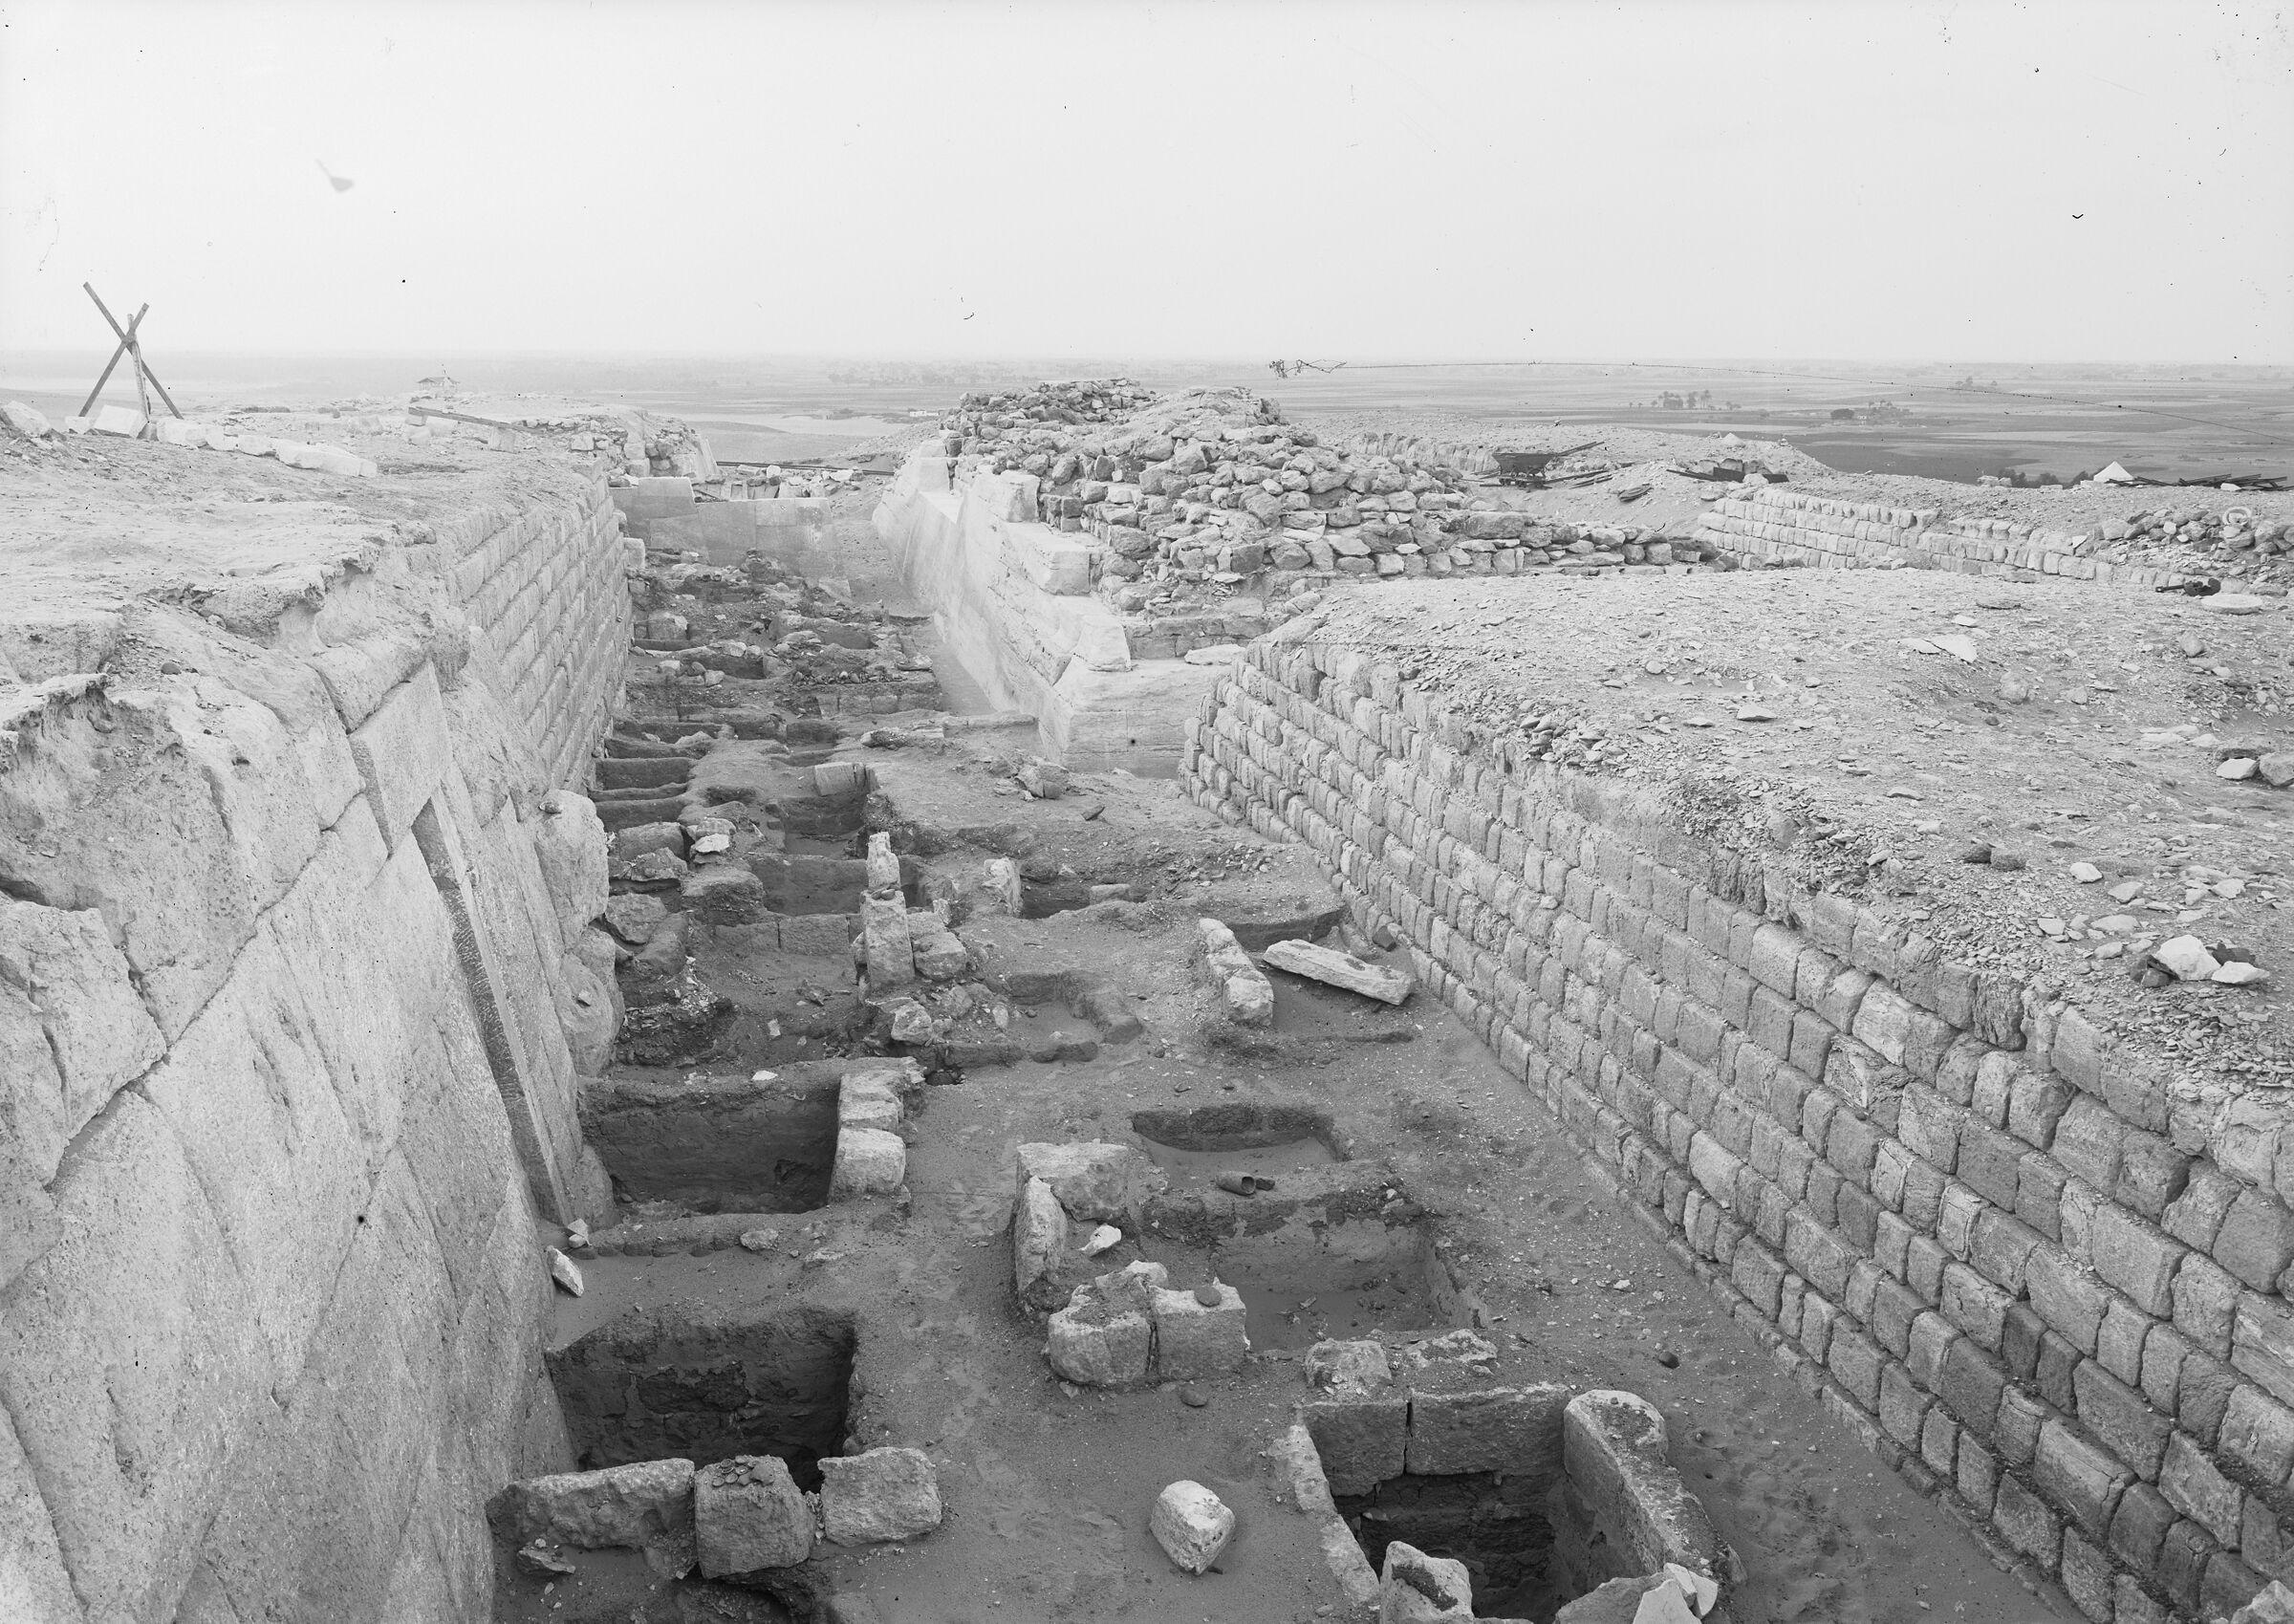 Western Cemetery: Site: Giza; View: G 2100, G 2100-I, G 2120, G 2130, G 2103, G 2104, G 2105, G 2110